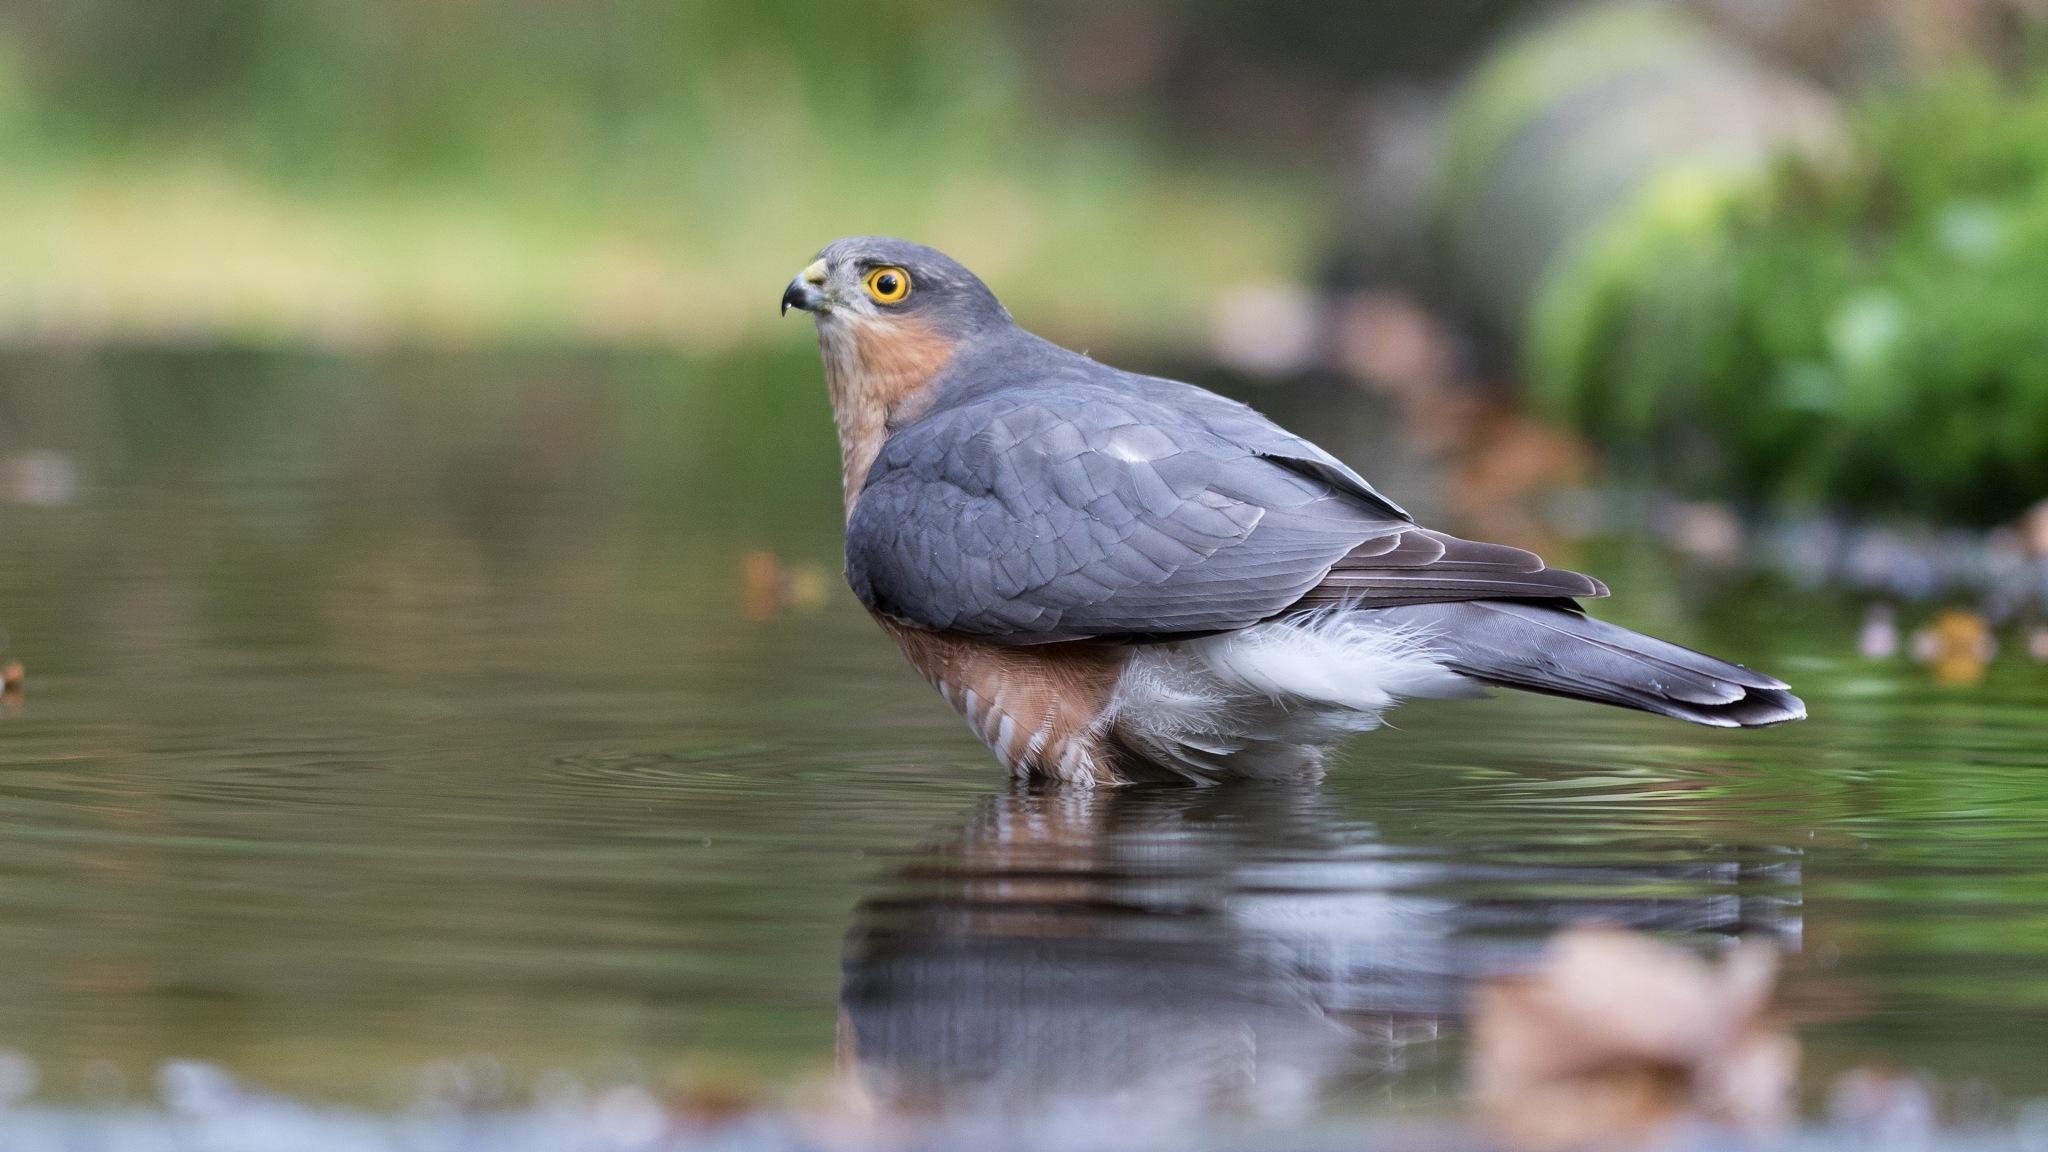 Eurasian sparrowhawk taking a bath by Anton Lemmers